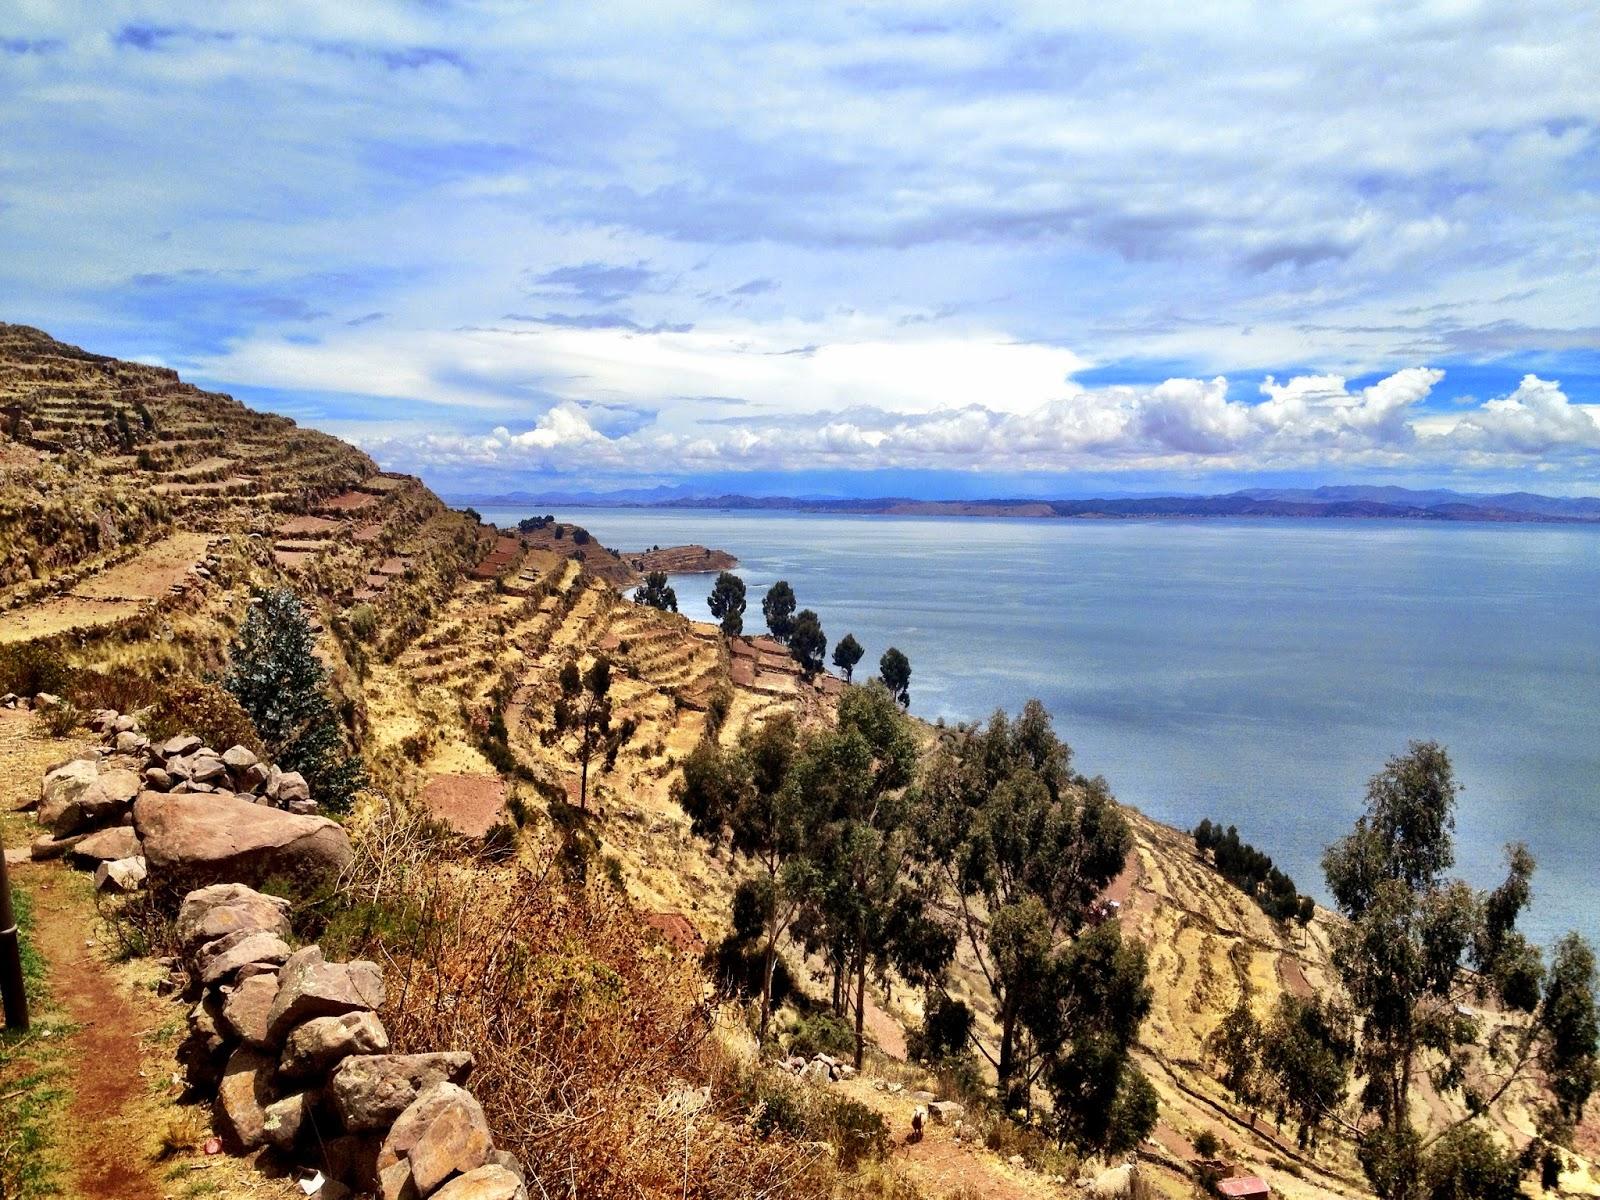 Farming terraces down to the sea - Taquile Island